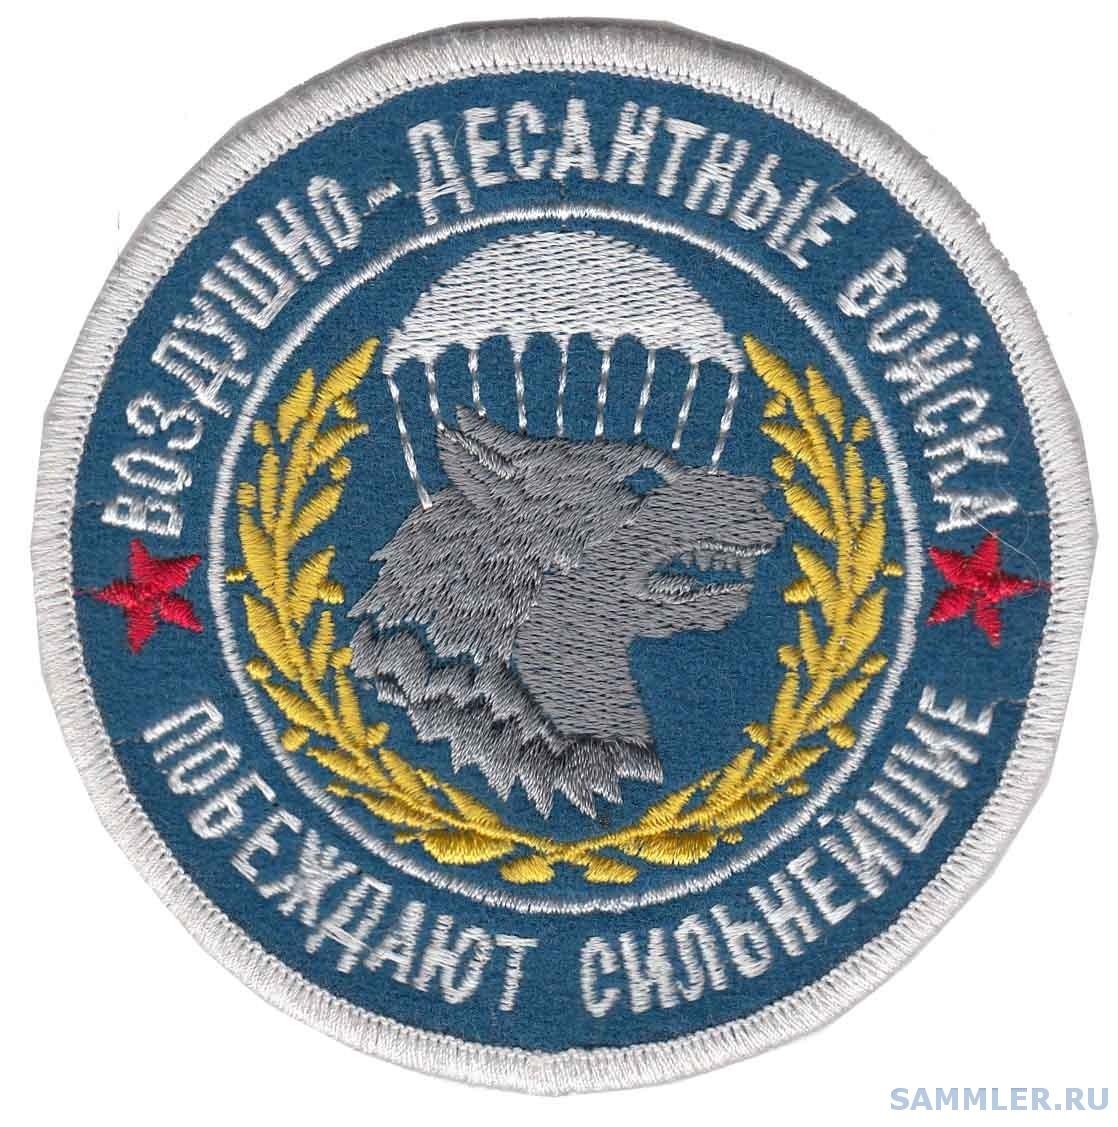 45 полк спец. назначения_0006.jpg